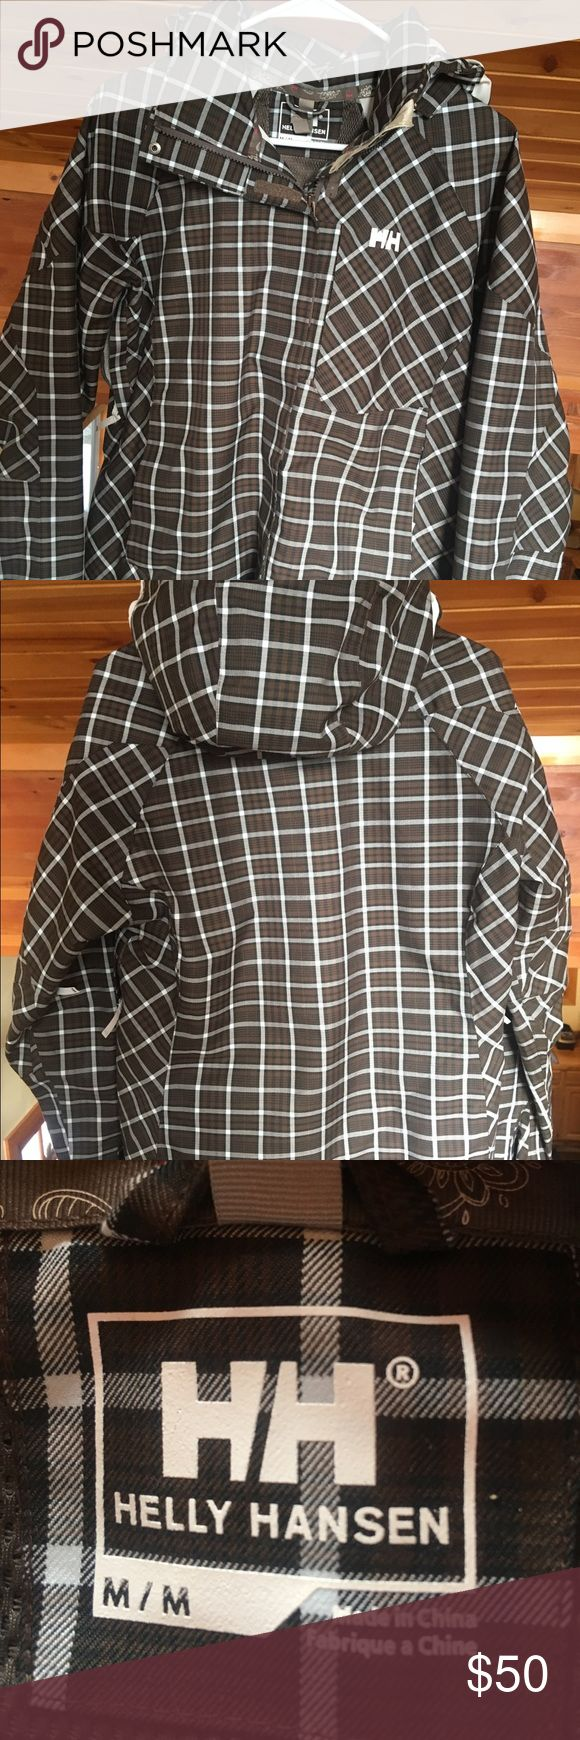 Helly Hansen Ski Jacket. Like New. Women's size Medium Helly Hansen waterproof ski jacket. Like new condition. Helly Hansen Jackets & Coats